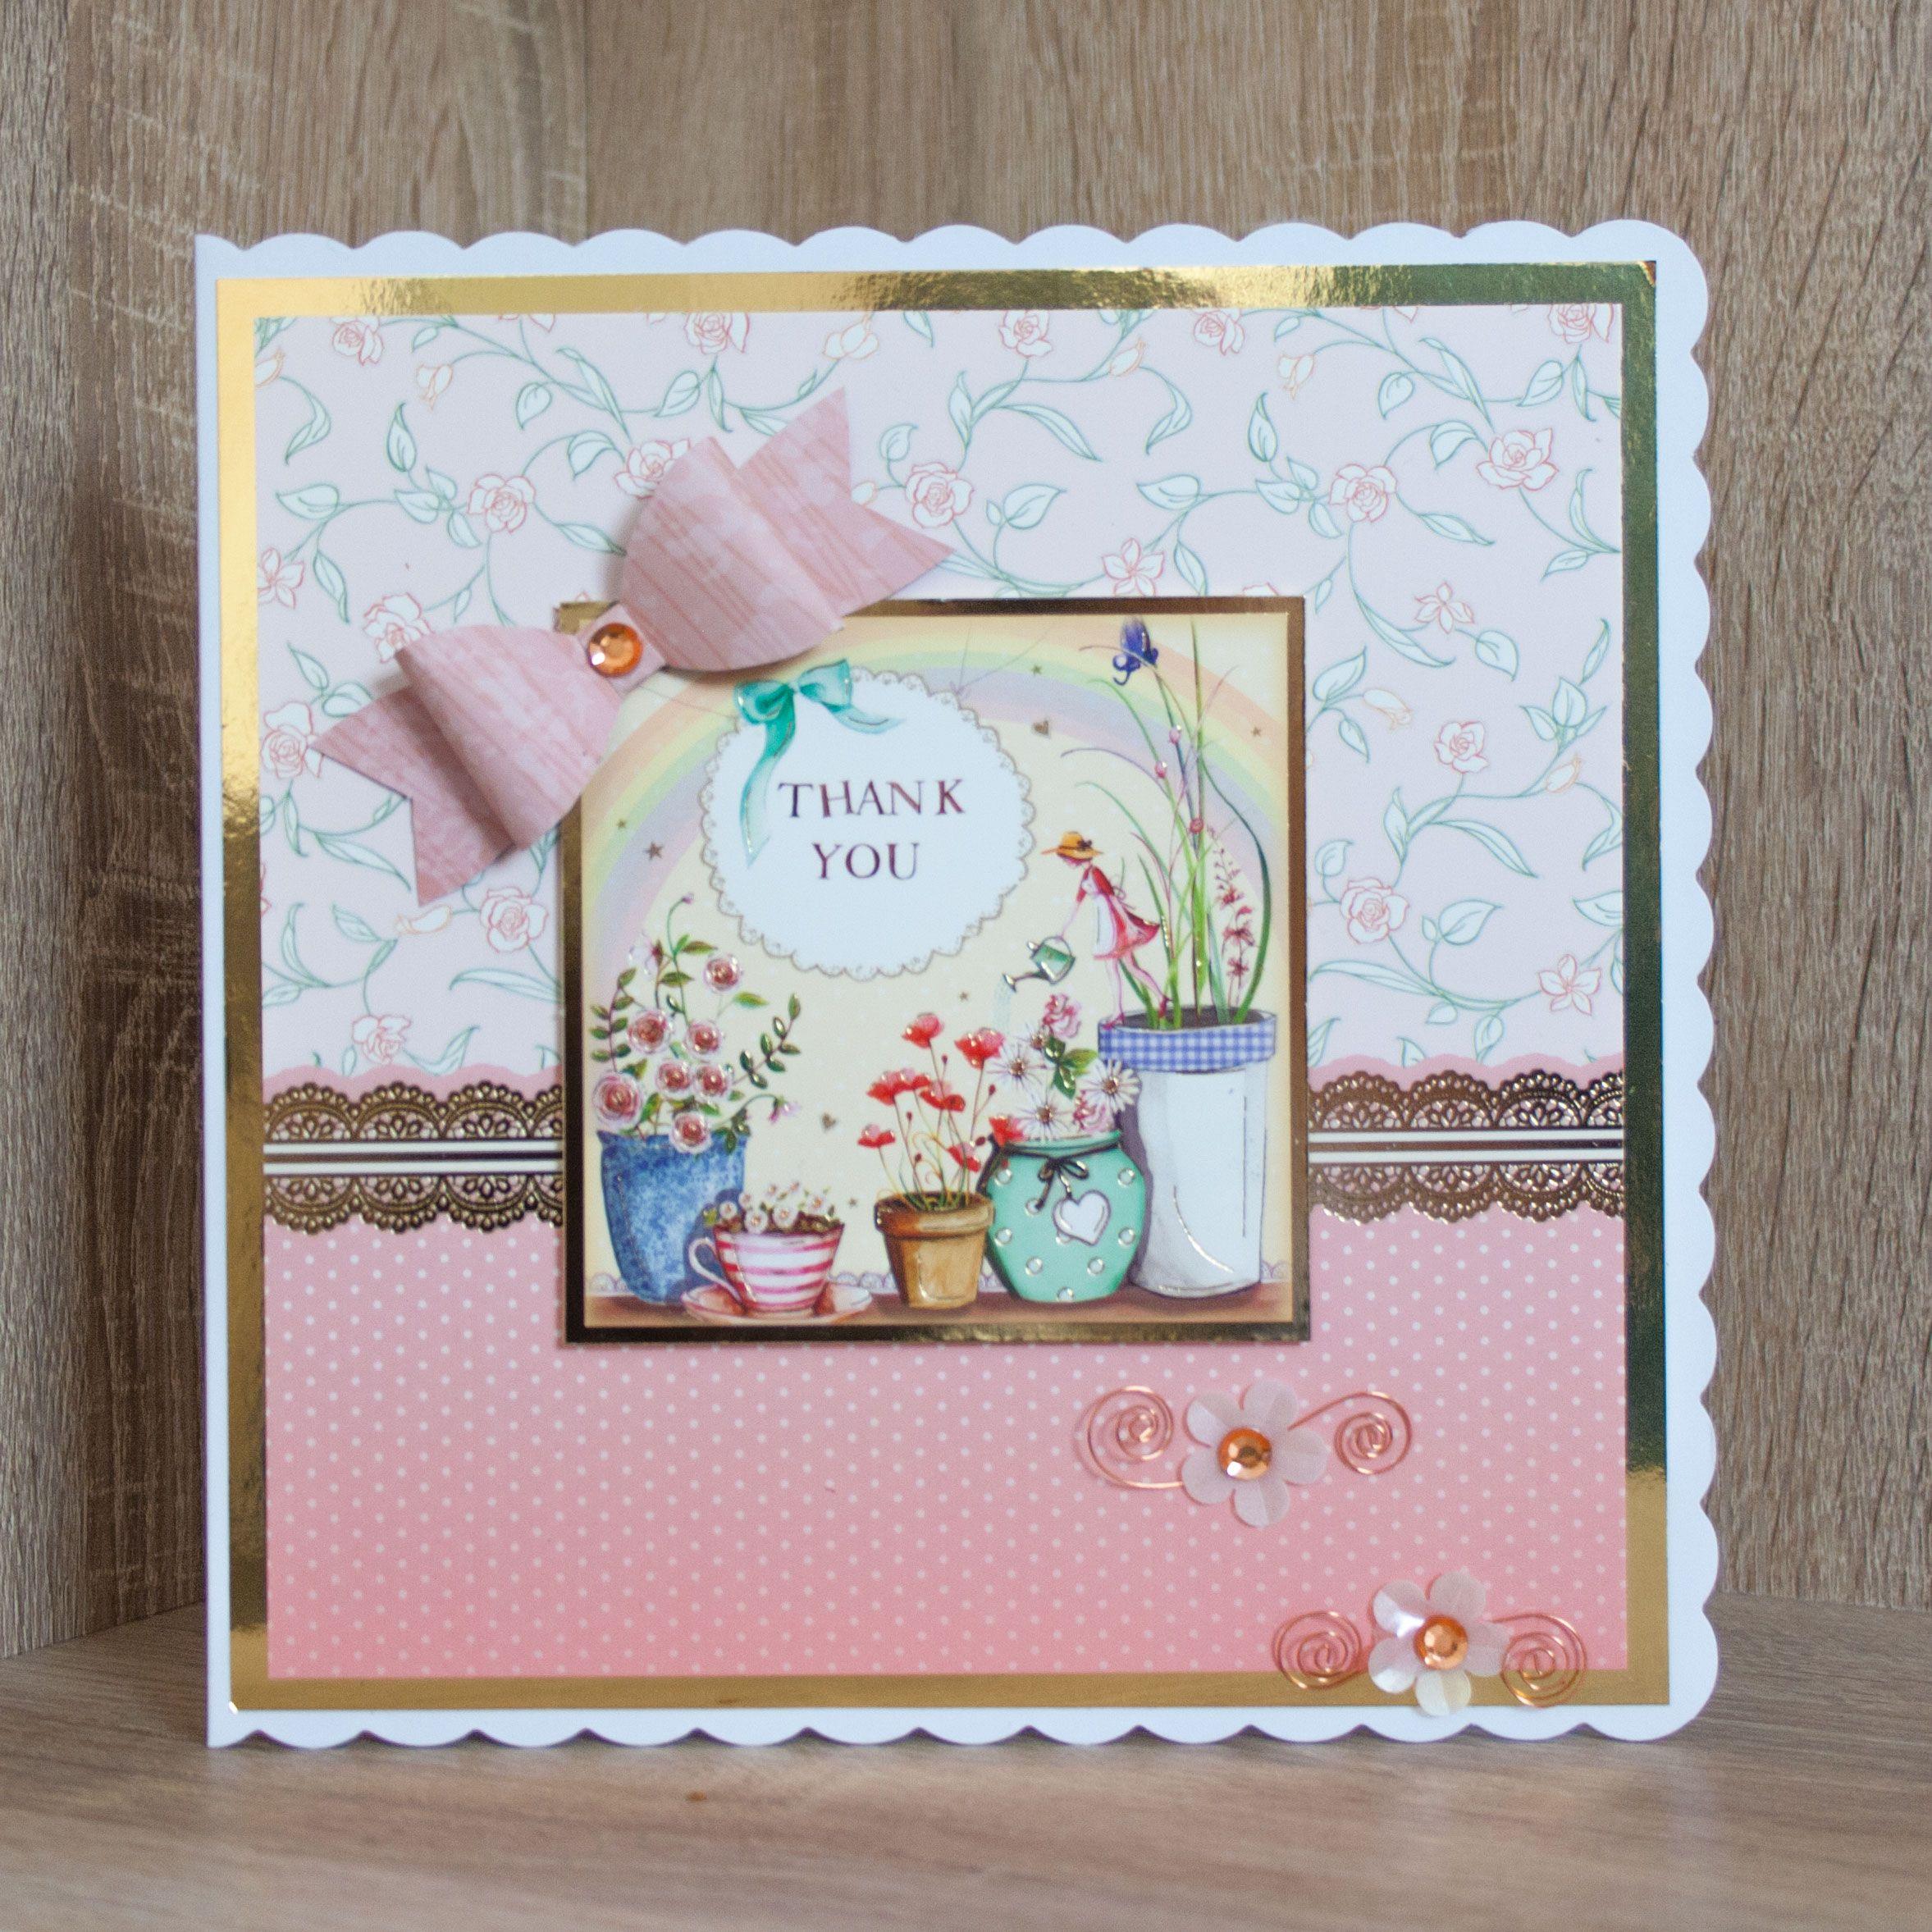 handmade thank you card made using hunkydory's thoughtful